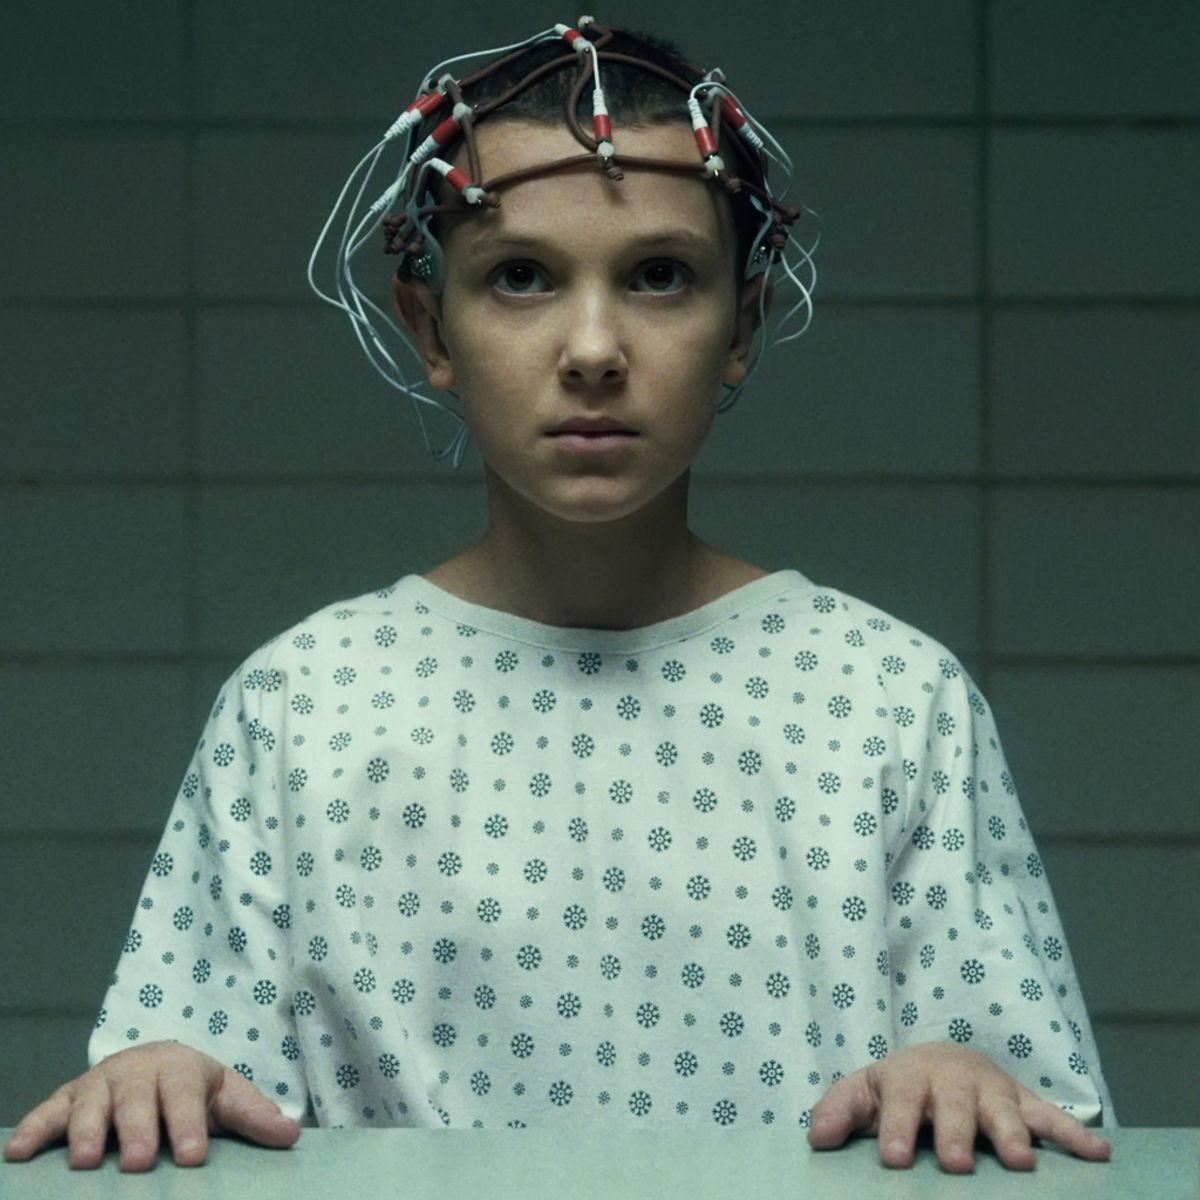 stranger things in store for eleven in season 3 says millie bobby